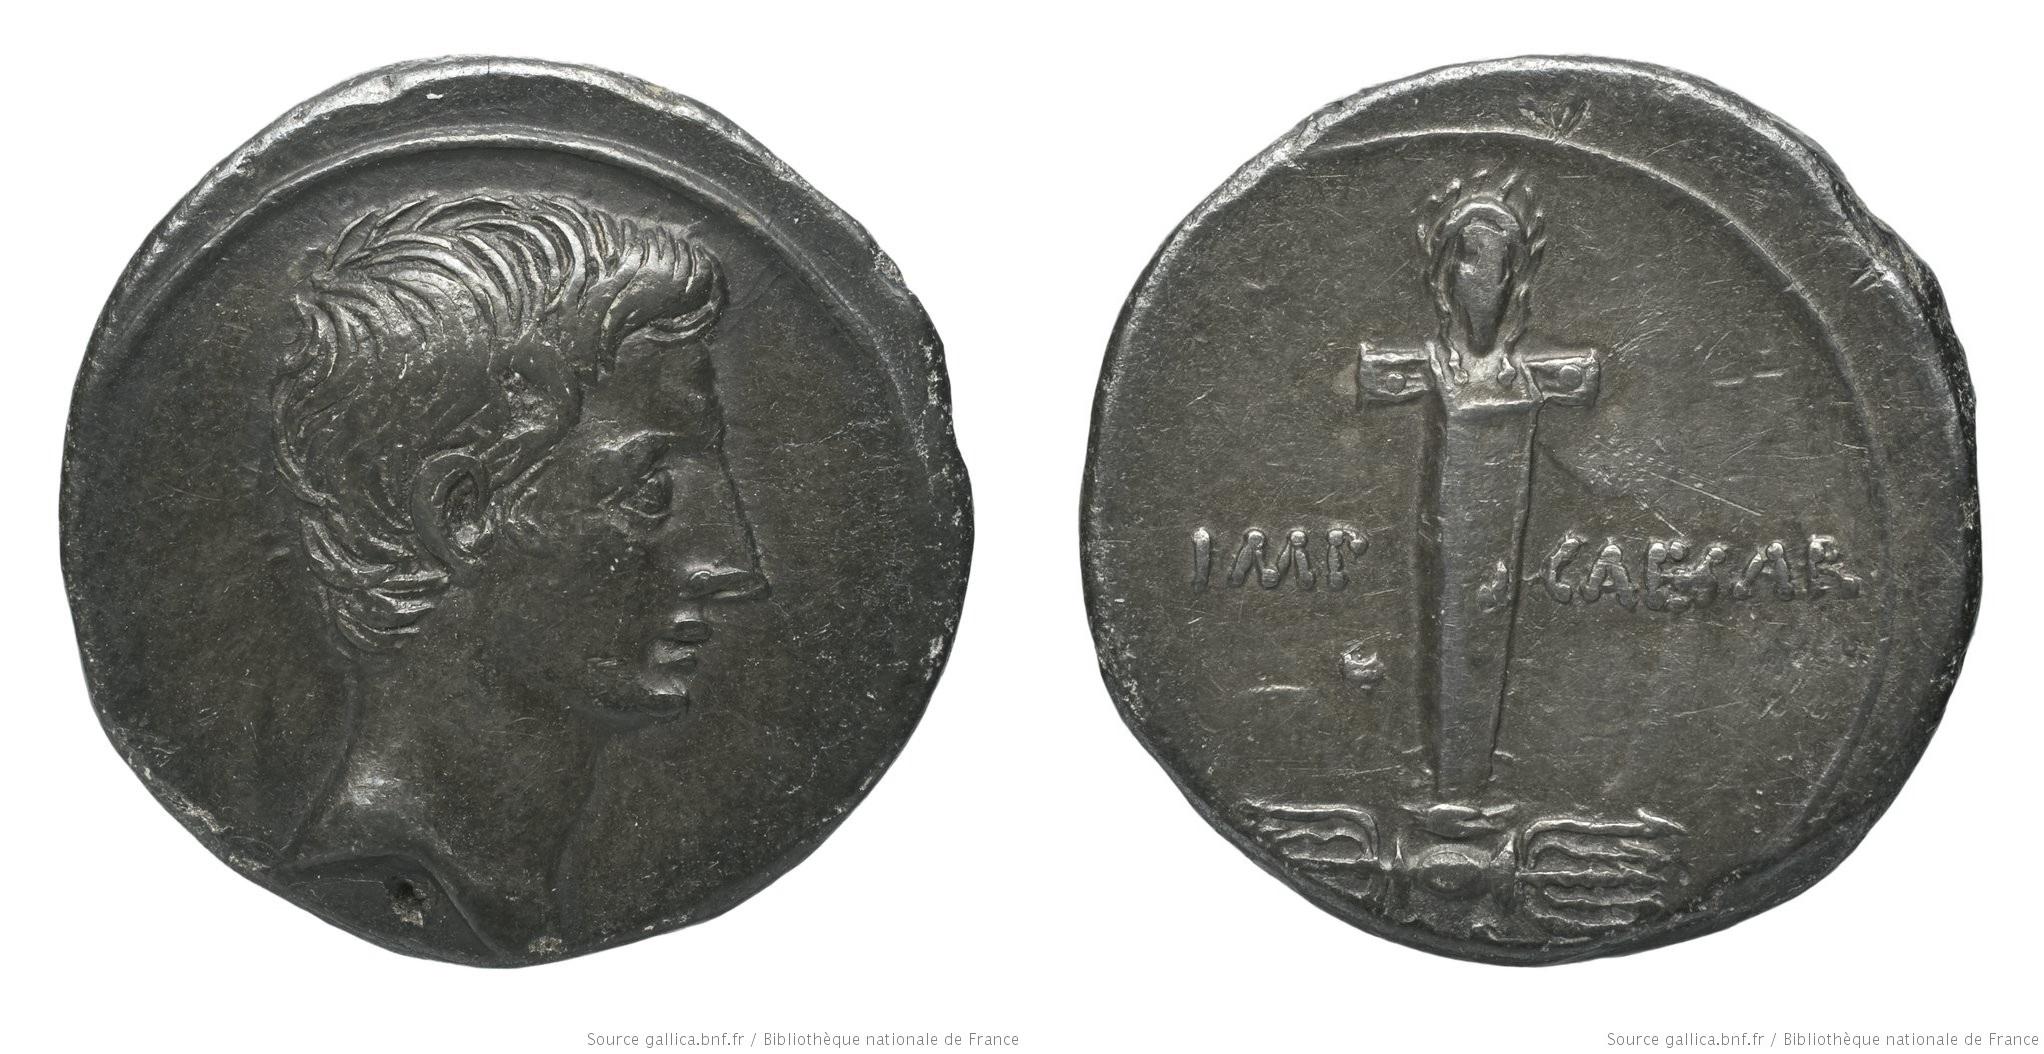 You are currently viewing 2023AU – Denier Octave – Caius Julius Cæsar Octavianus